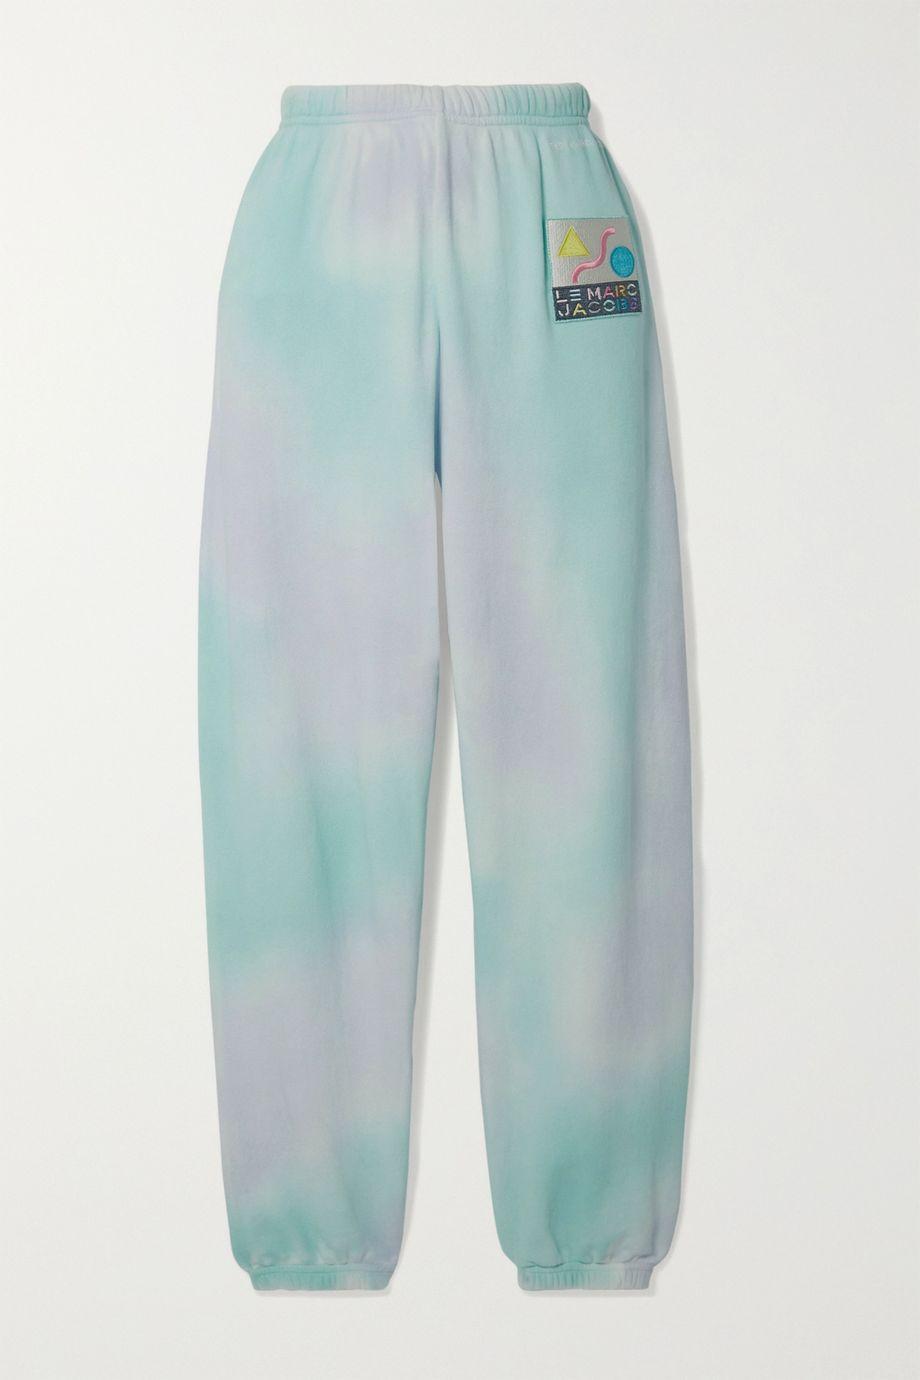 THE Marc Jacobs Appliquéd tie-dyed cotton-terry track pants